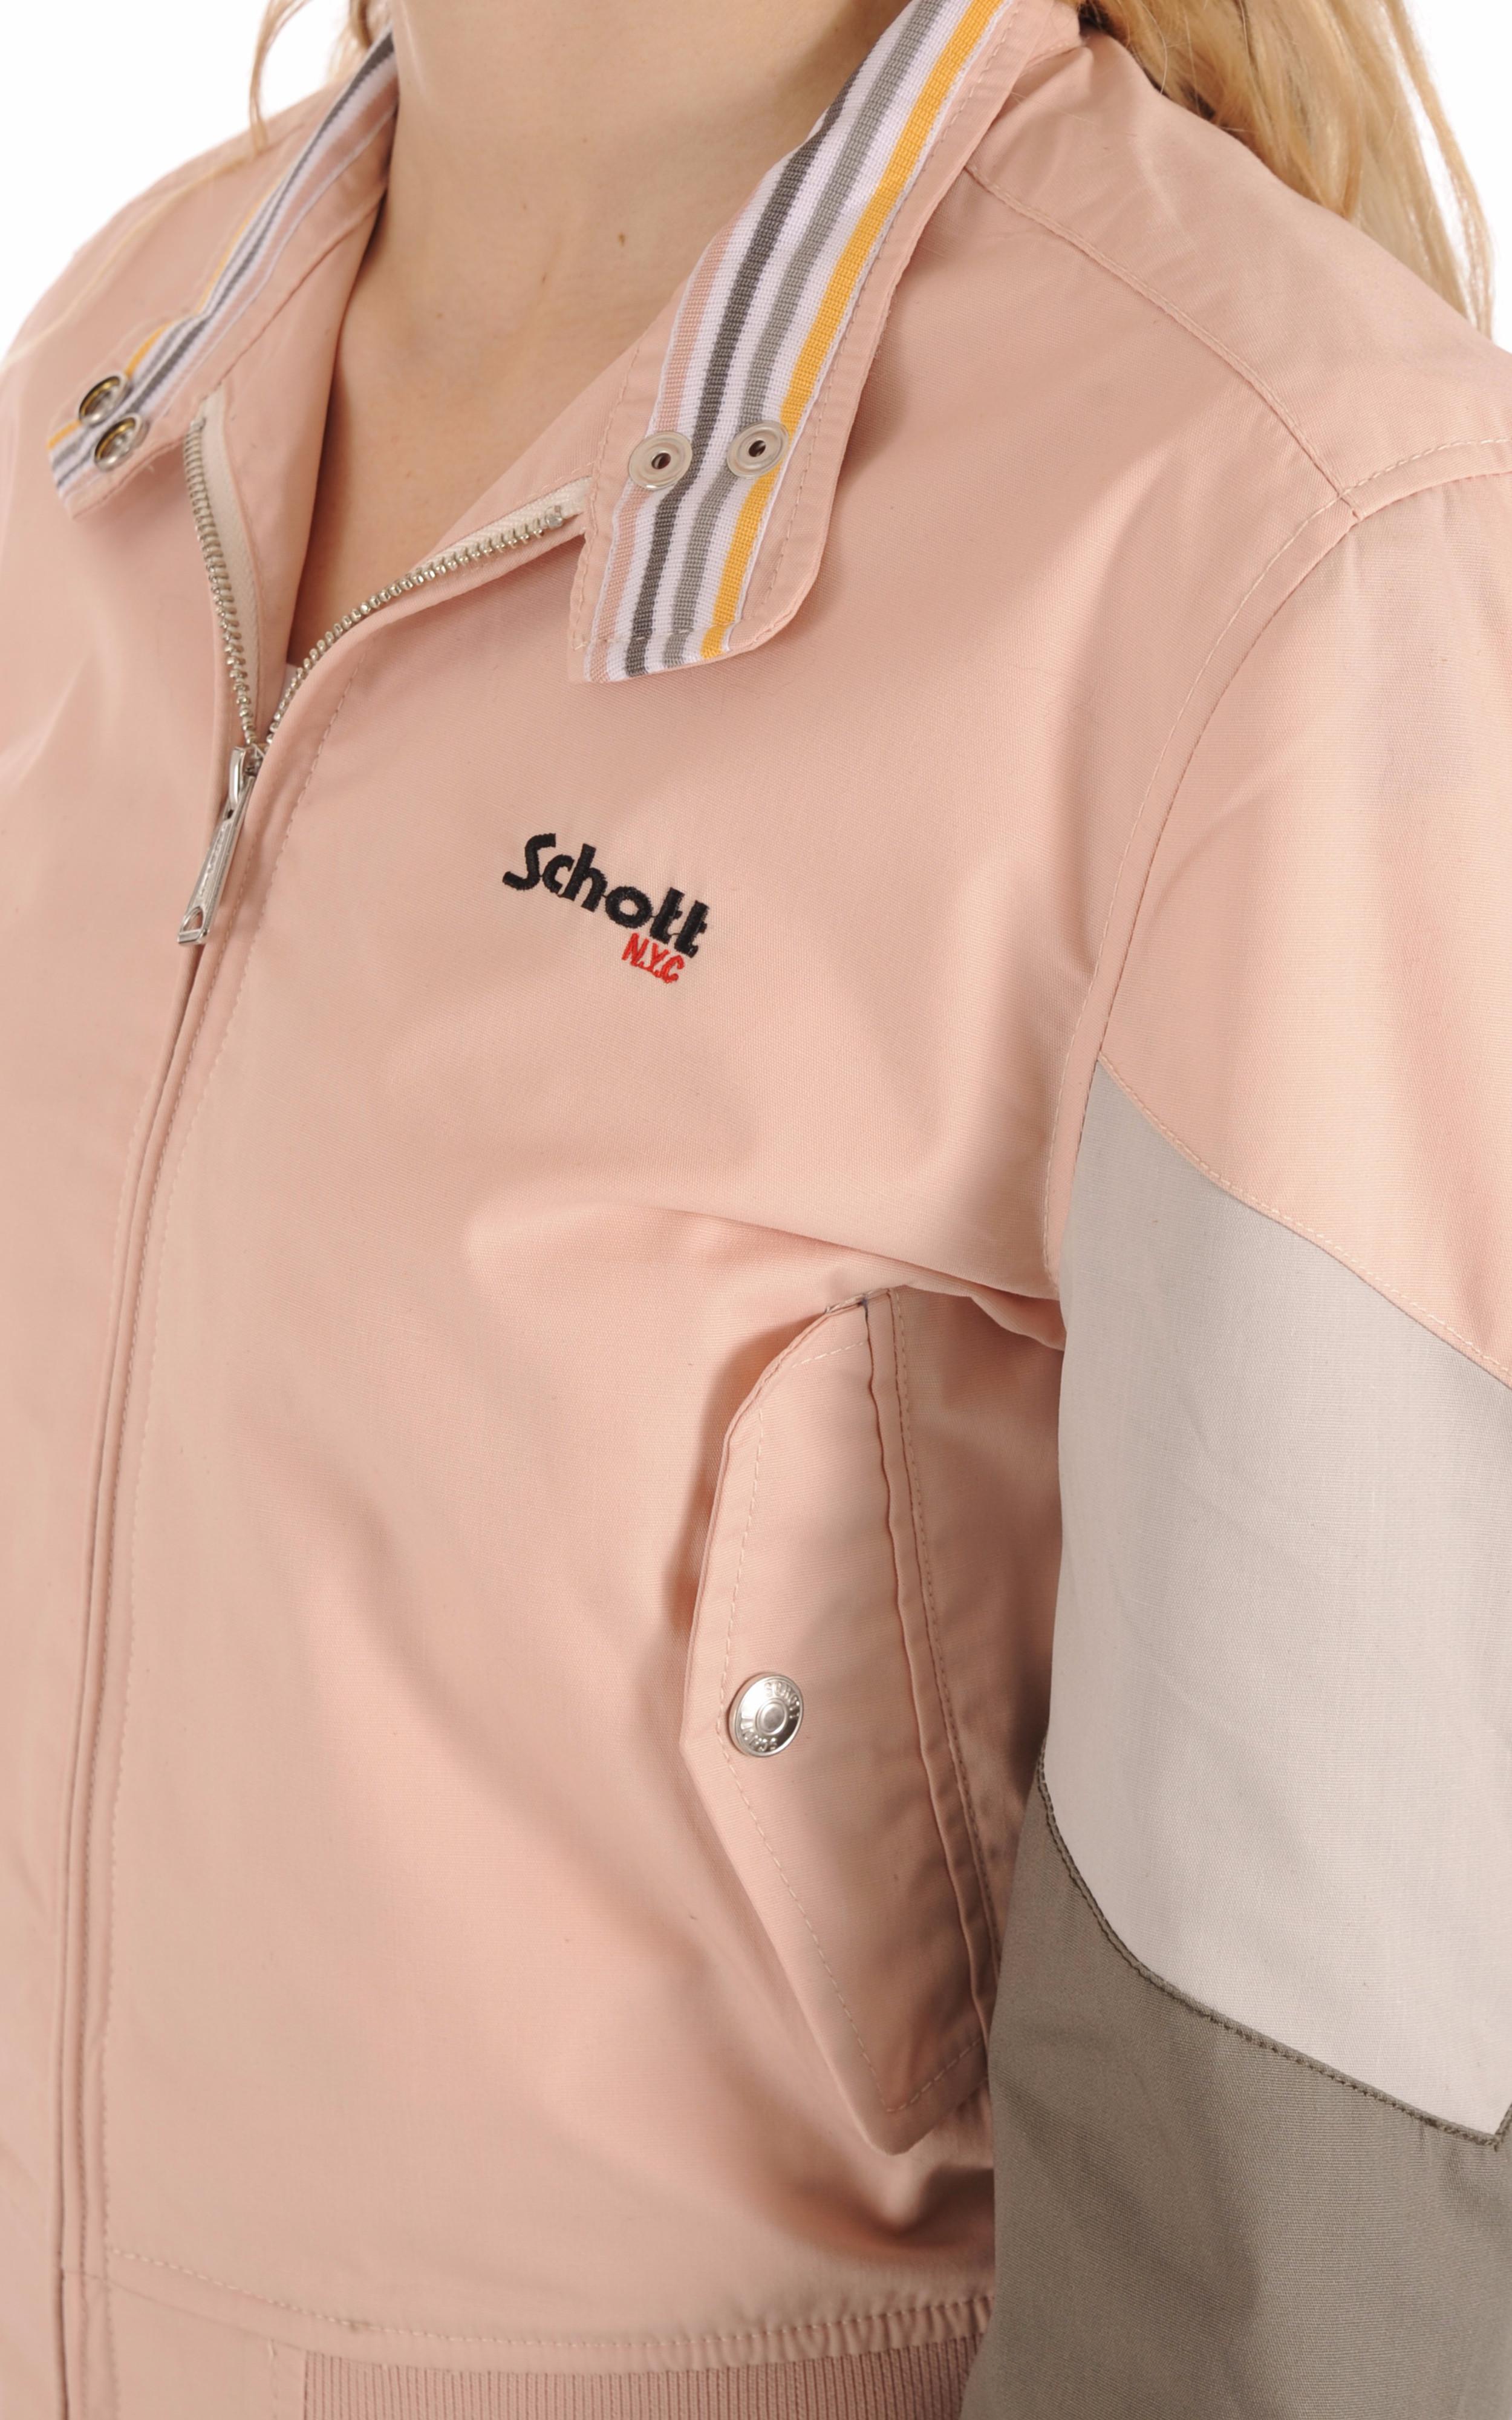 Blouson JktCabl90W Blush Schott